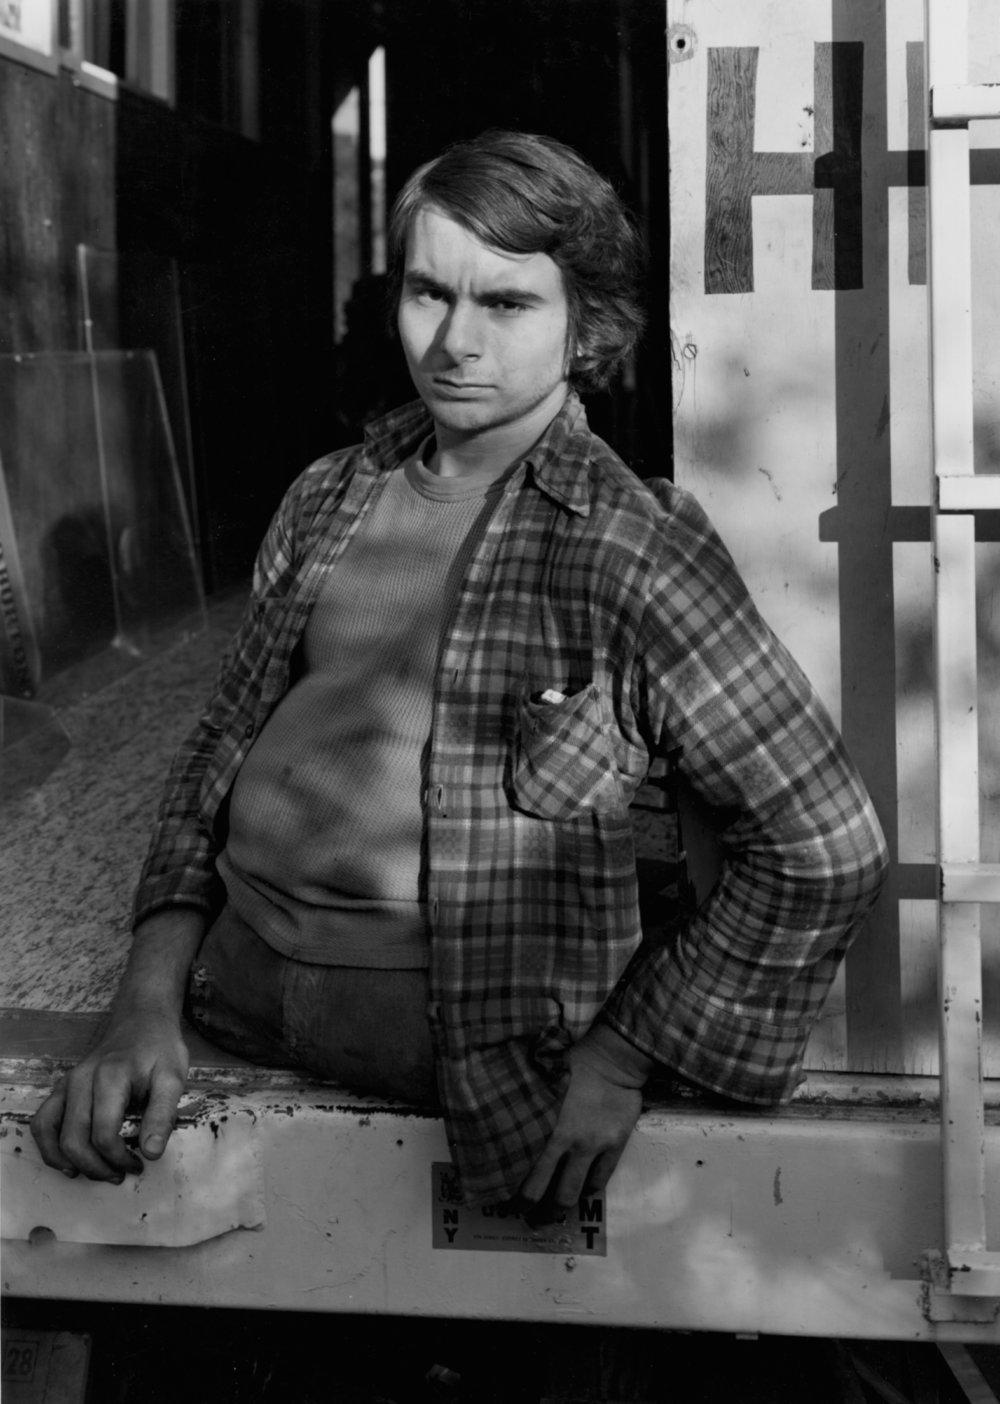 RANDAL LEVENSON, Quarterboy, Gibsonton, FL, 1974